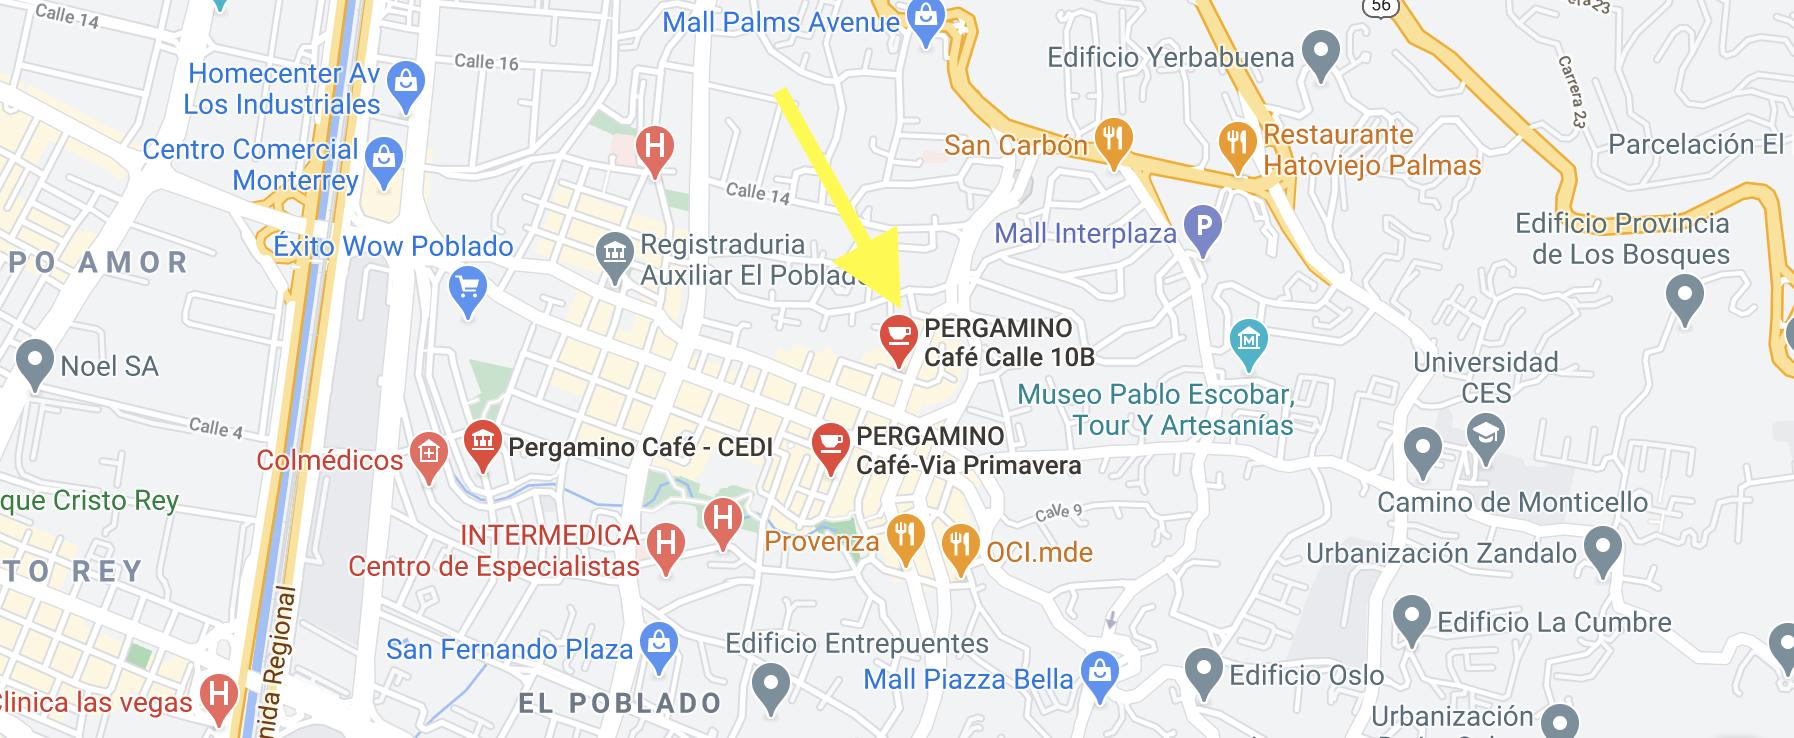 pergamino 2 in hidden part of provenza cafe